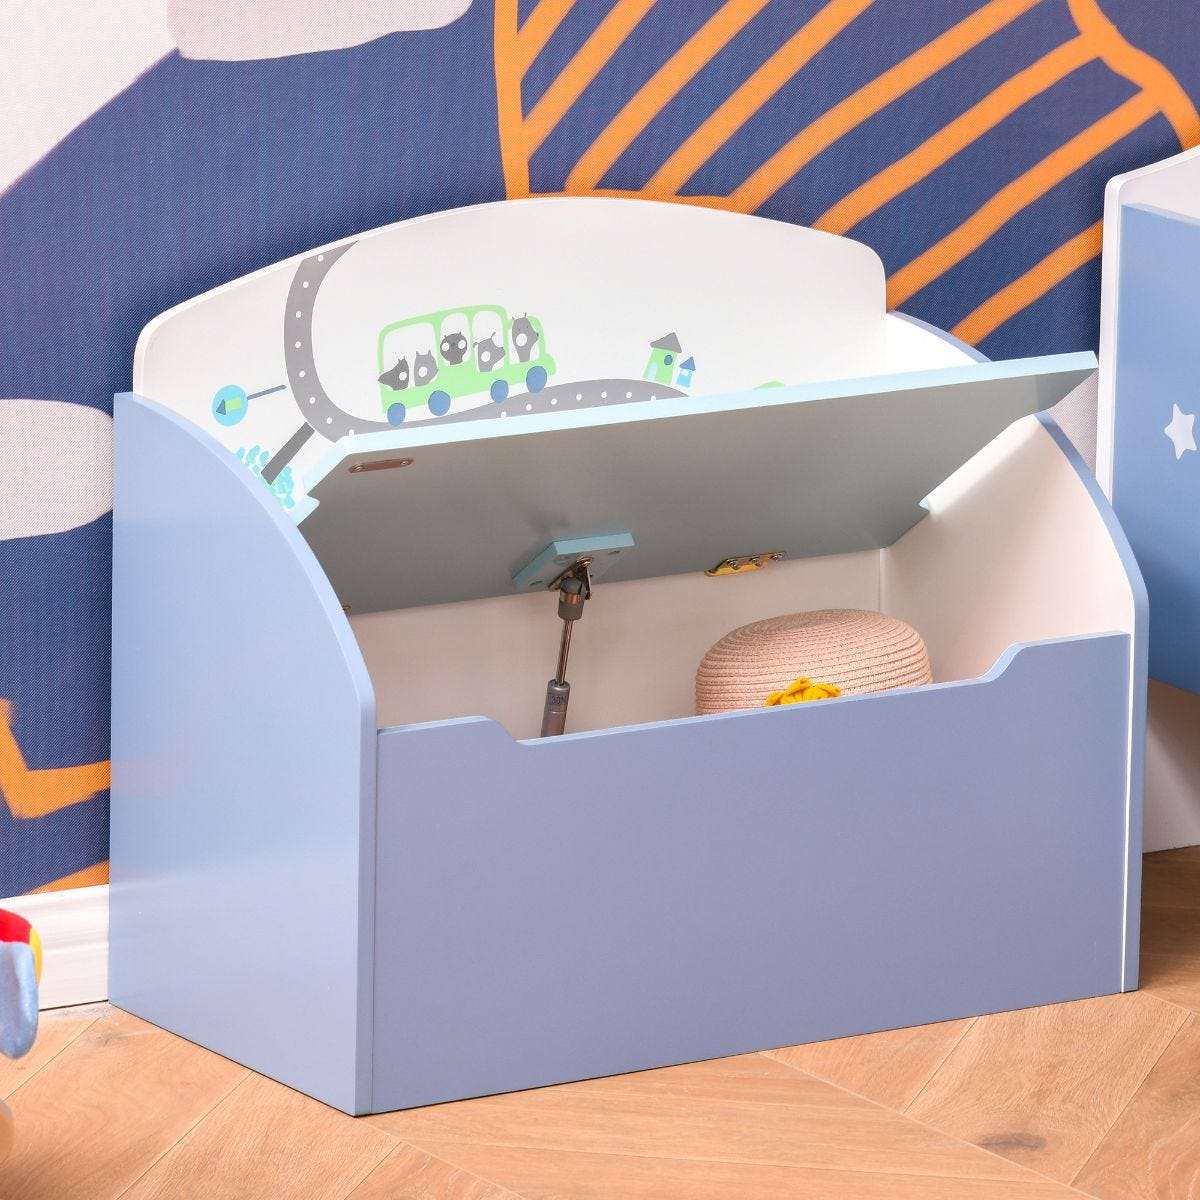 58 x 28cm Fun Kids Toy Storage Chest Box With Safety Hinge Blue